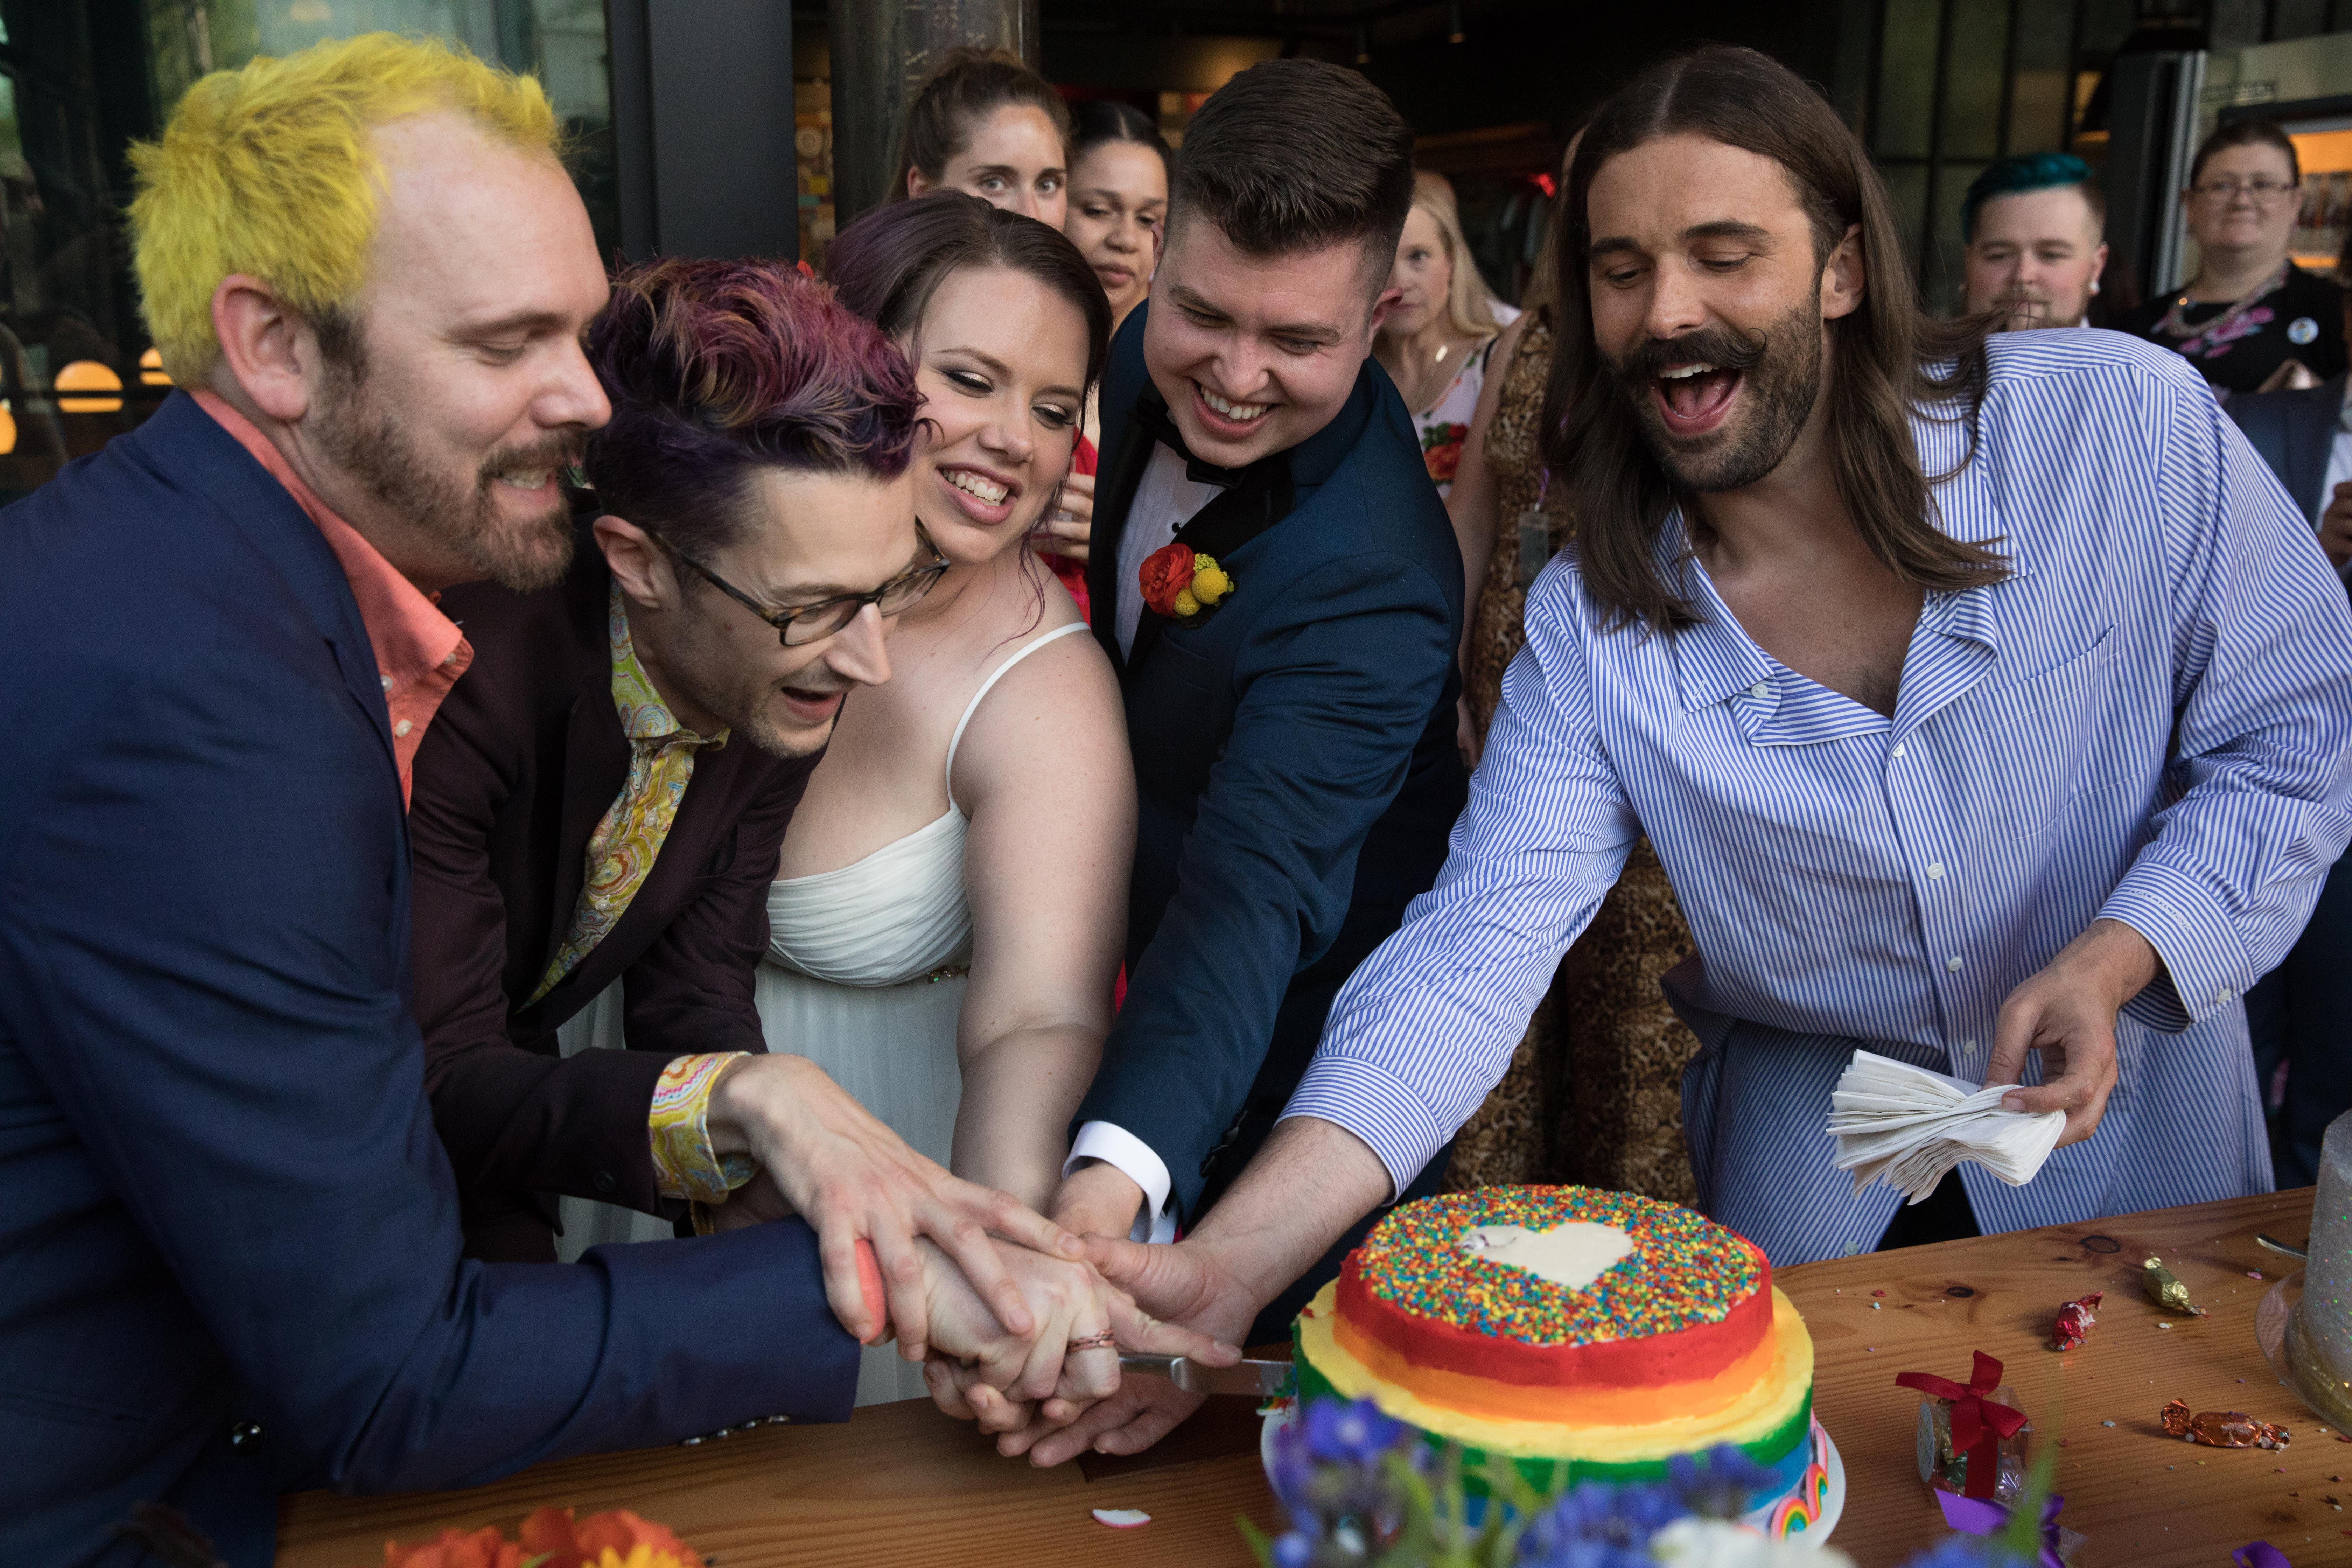 jonathan van ness wedding officiant cutting cake